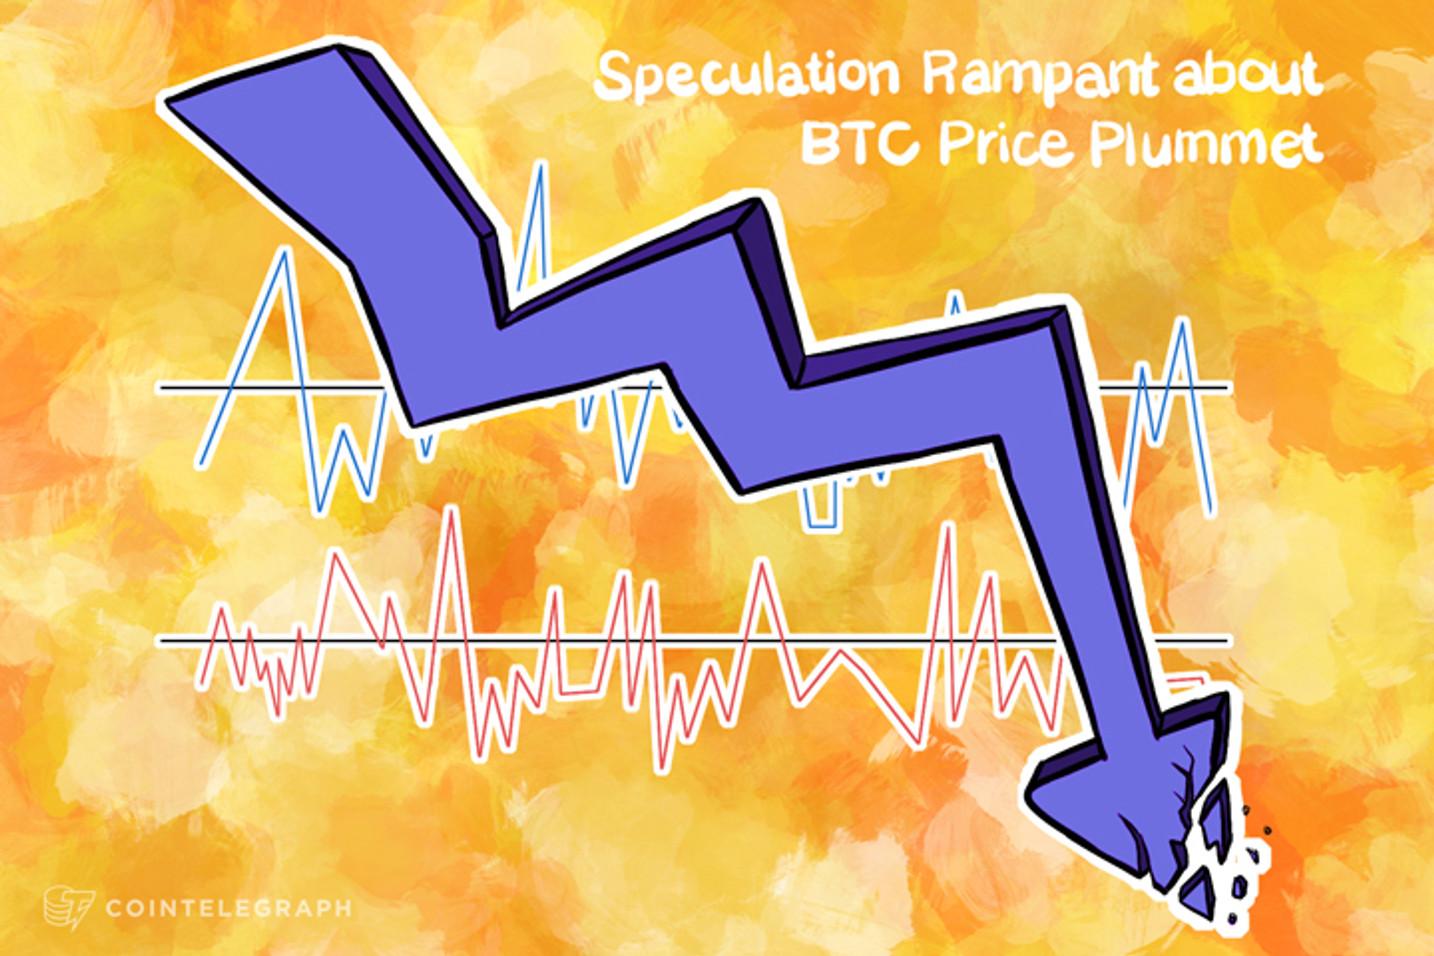 Speculation Rampant About BTC Price Plummet